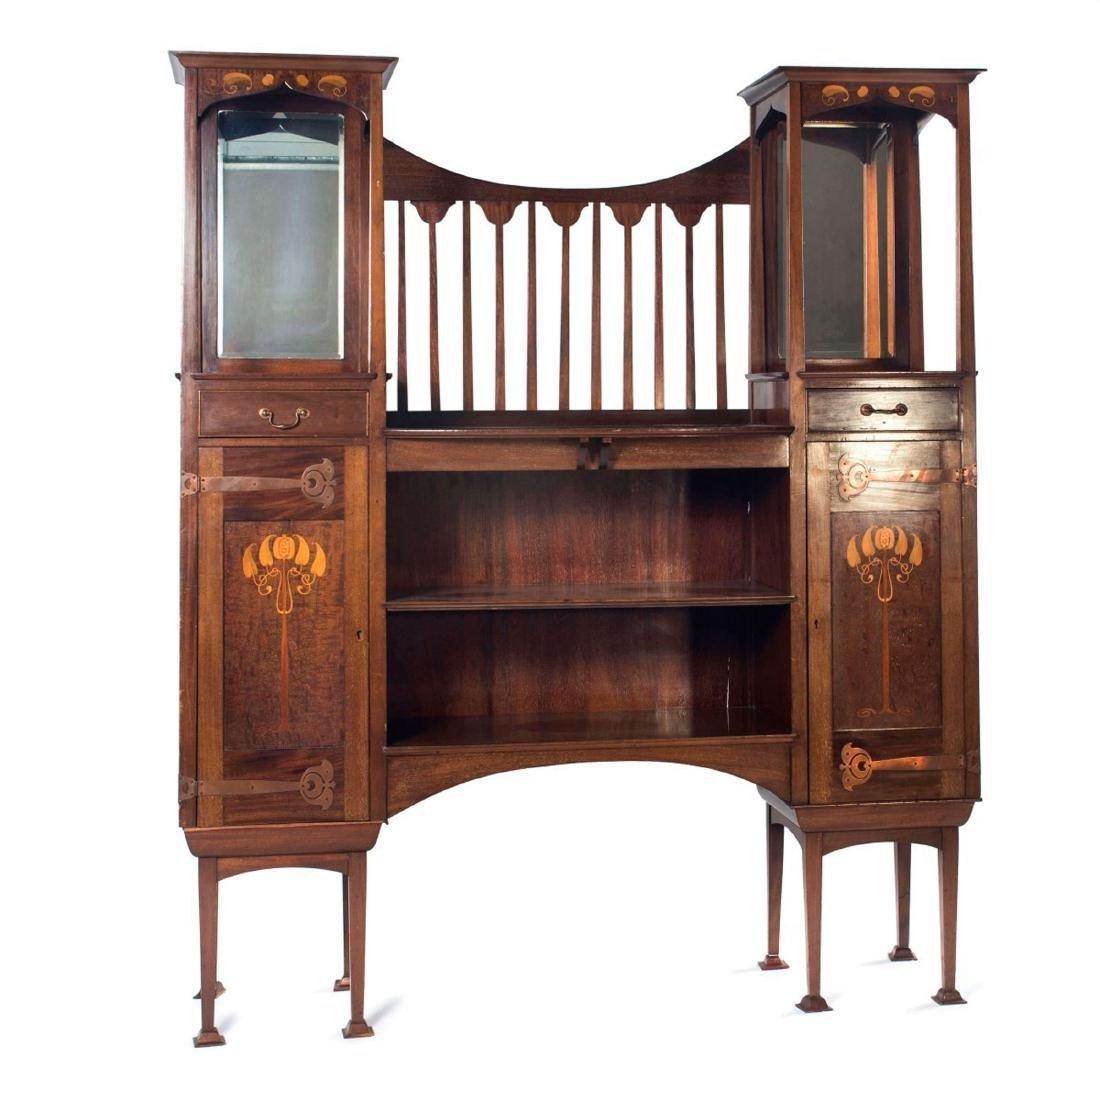 Display cabinet, c1905-10